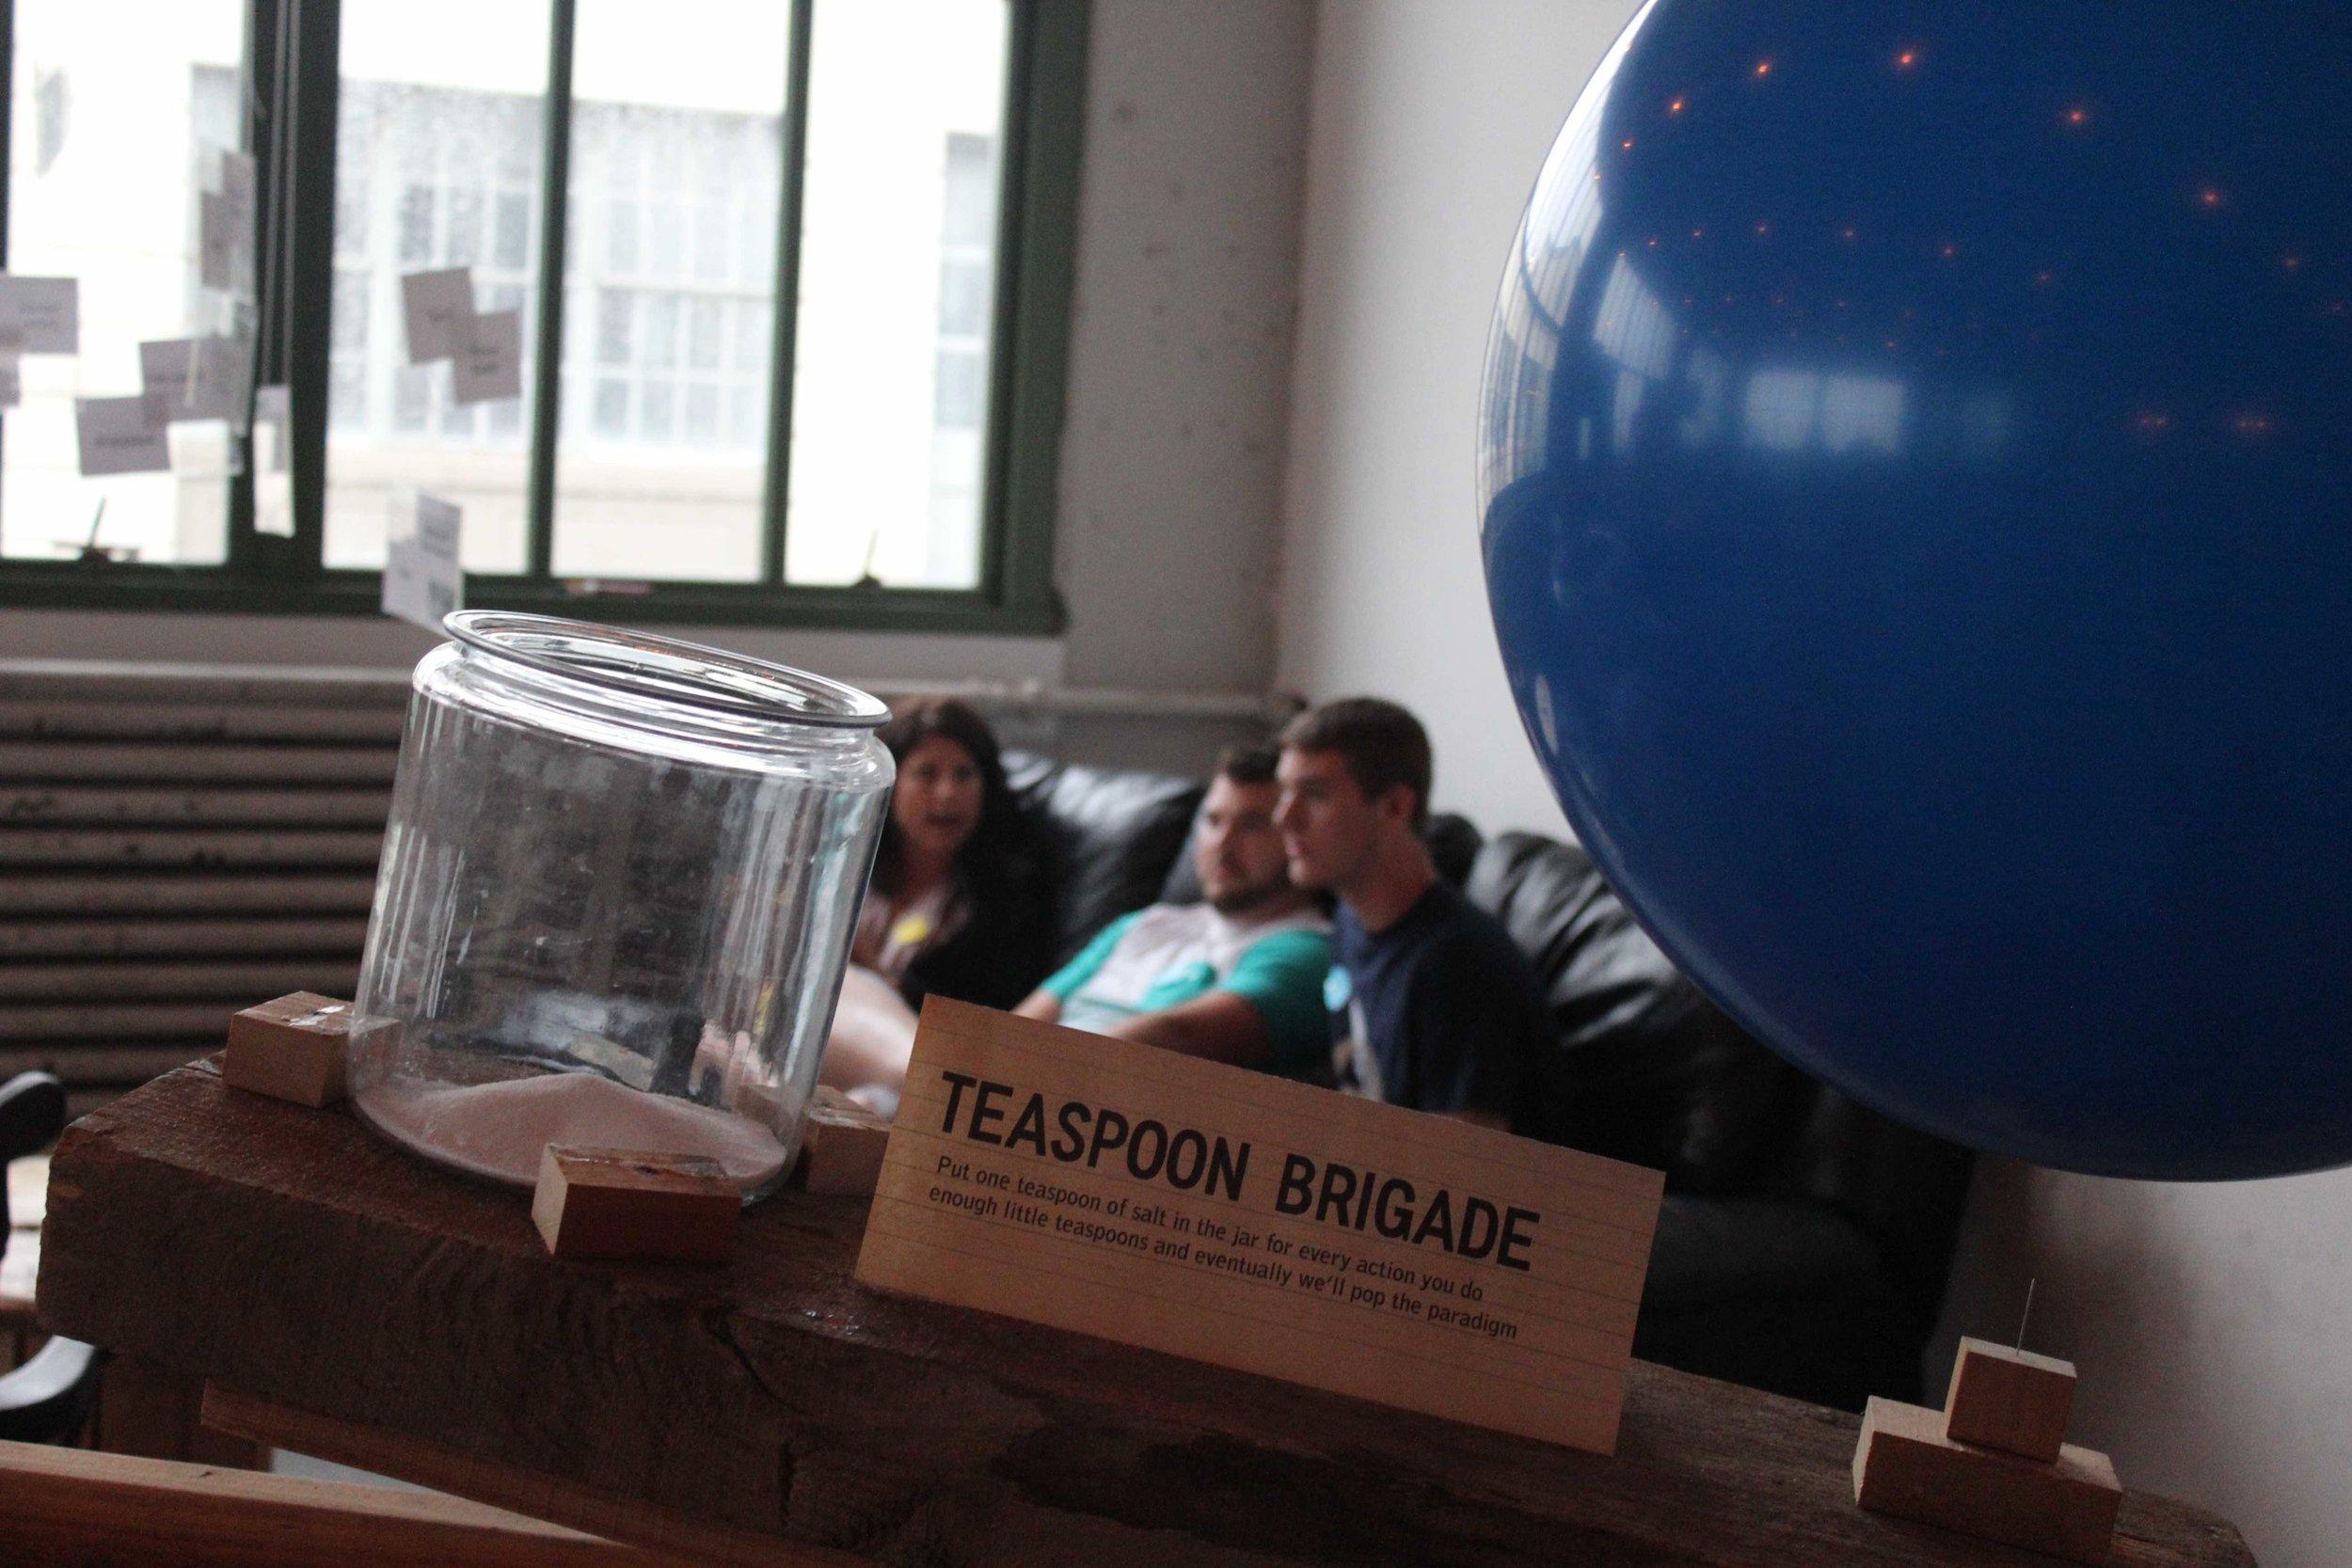 teaspoon brigade.web.jpg